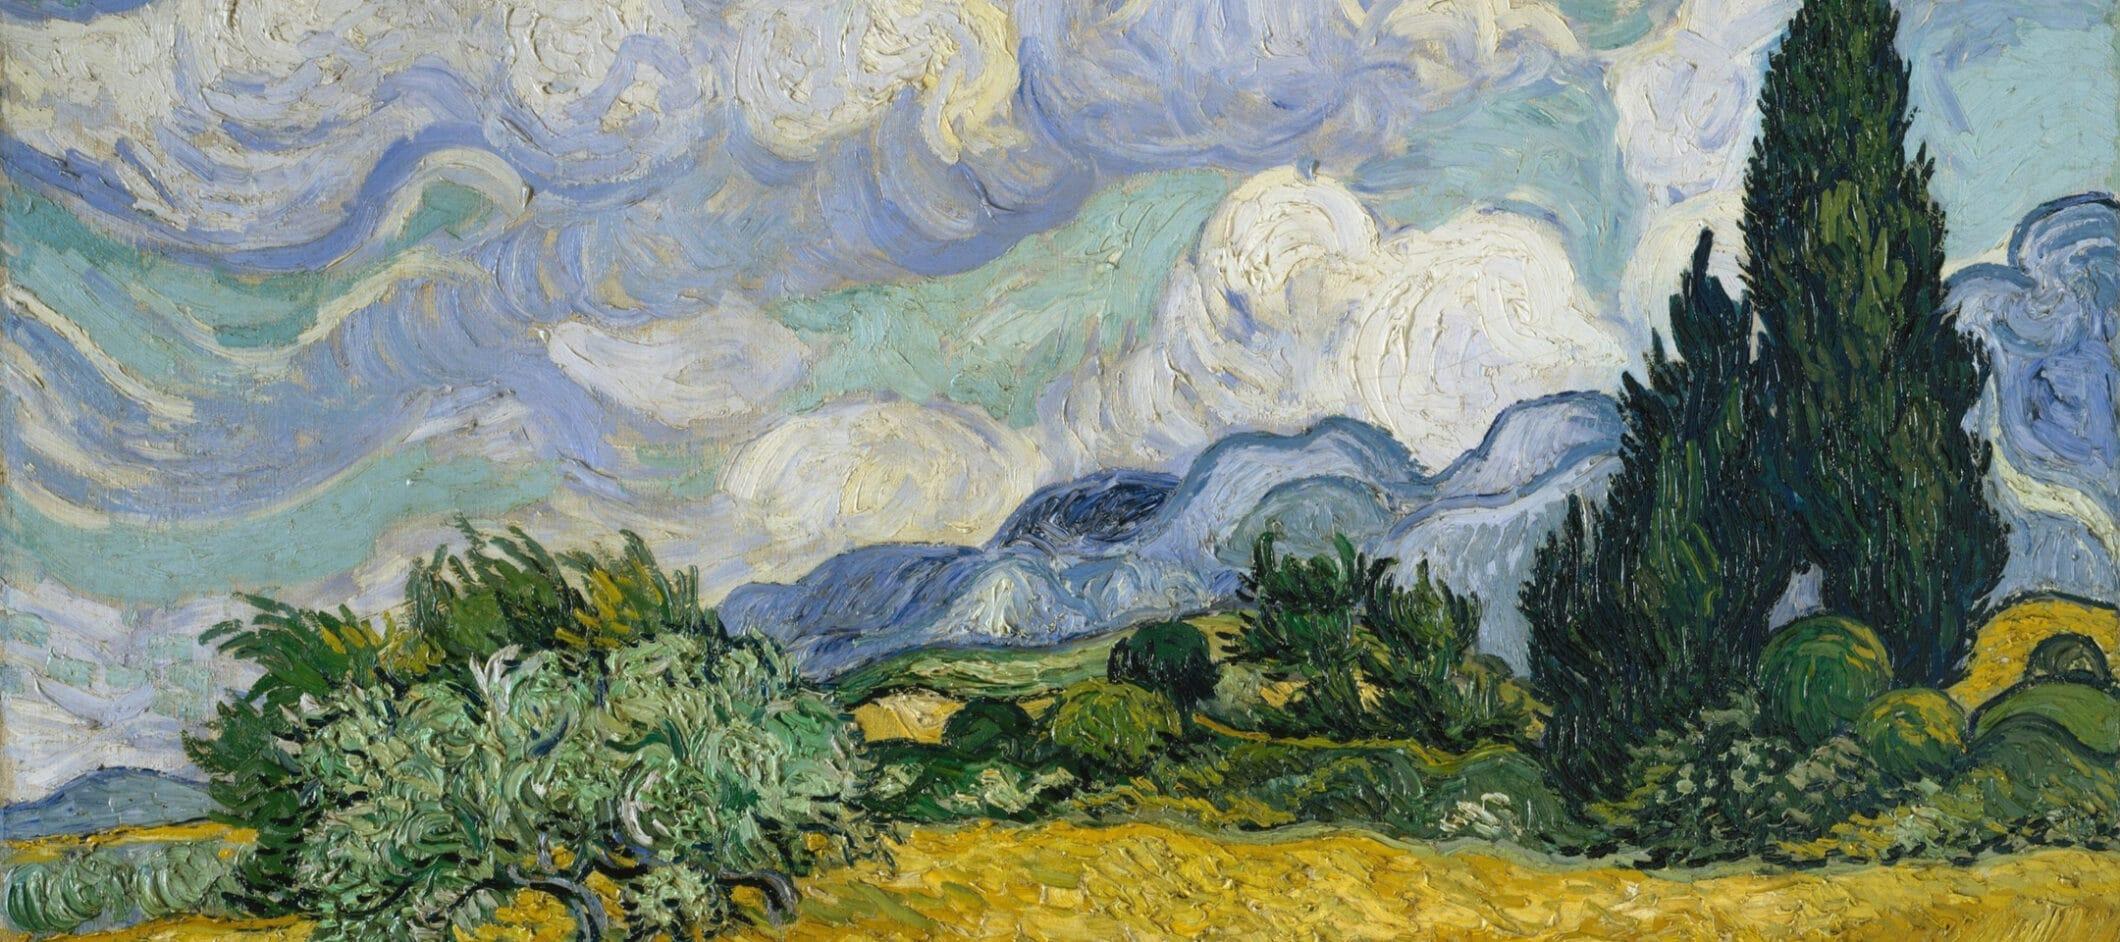 Impressionismus 1890 1920 Inhaltsangabe De